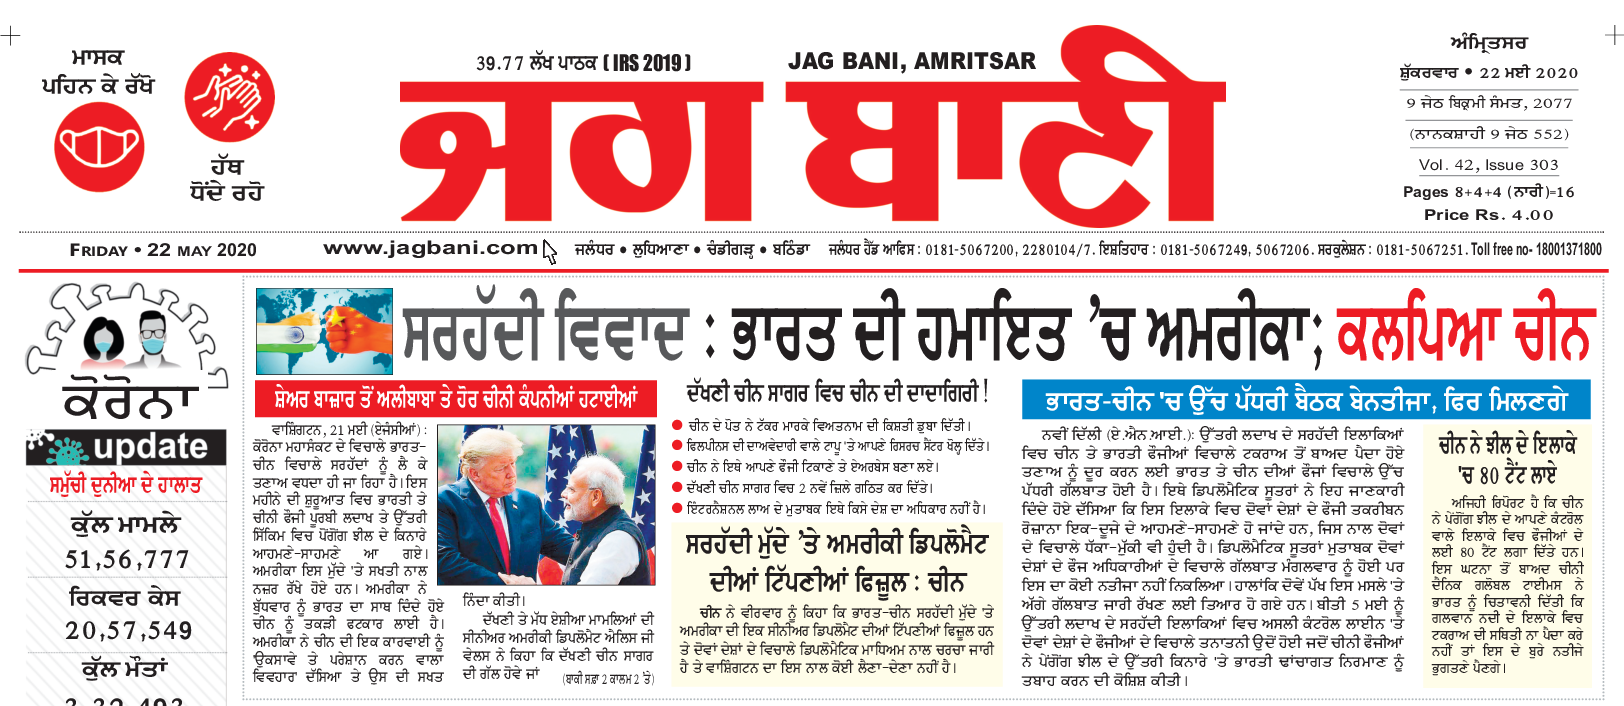 Amritsar Main 5/22/2020 12:00:00 AM